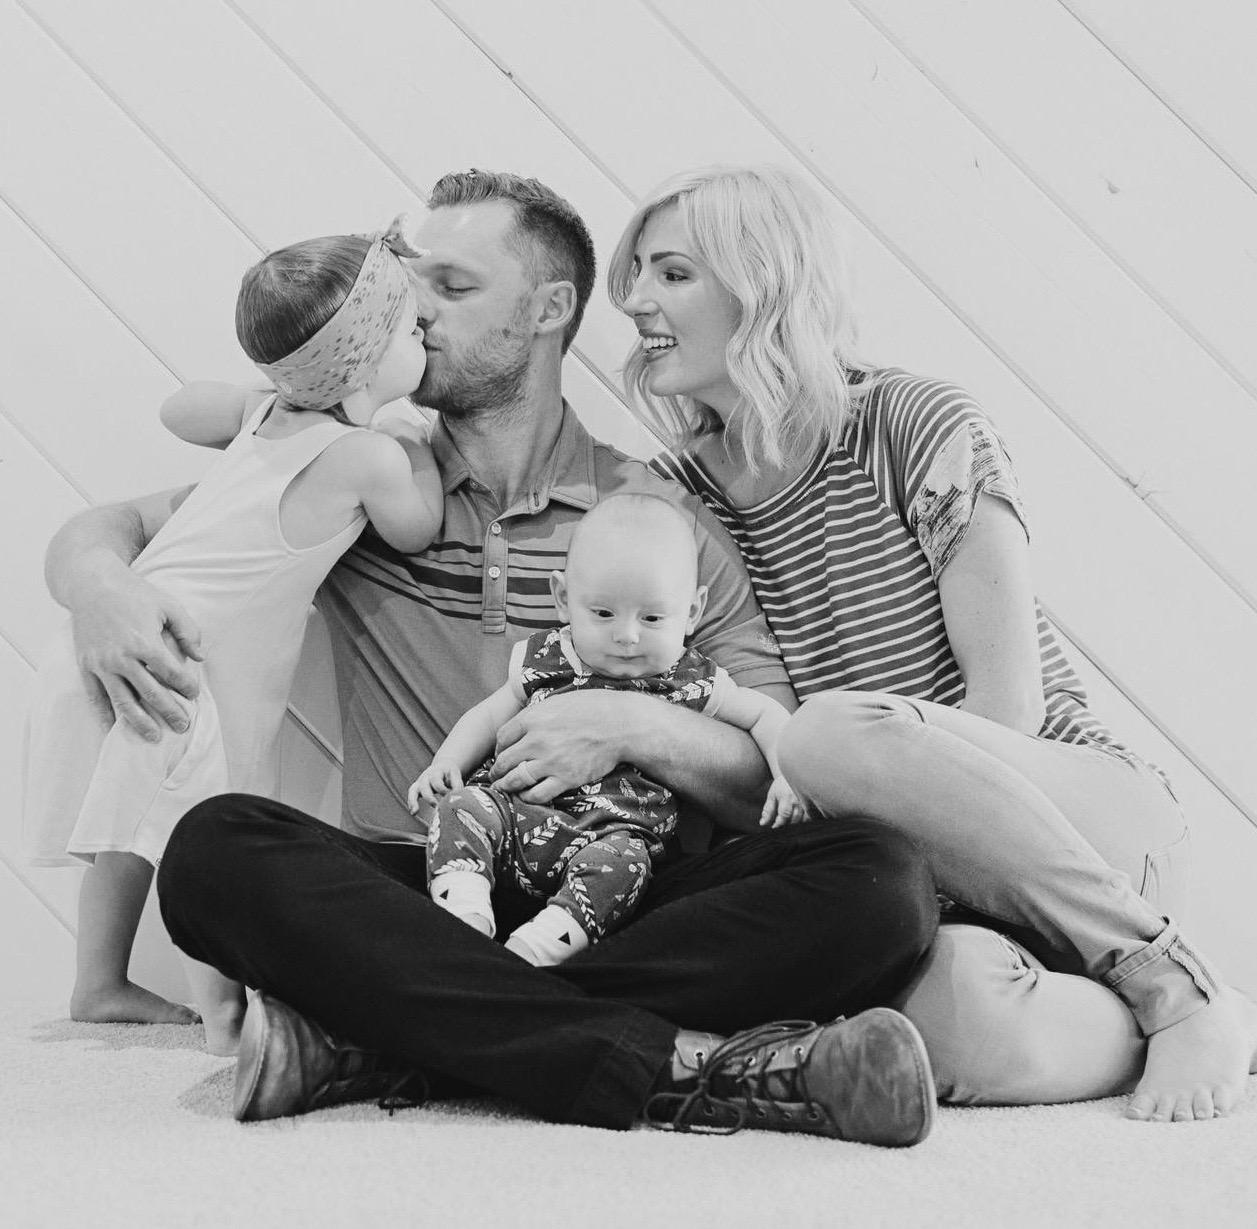 PuttTek_Augustyniak_Family